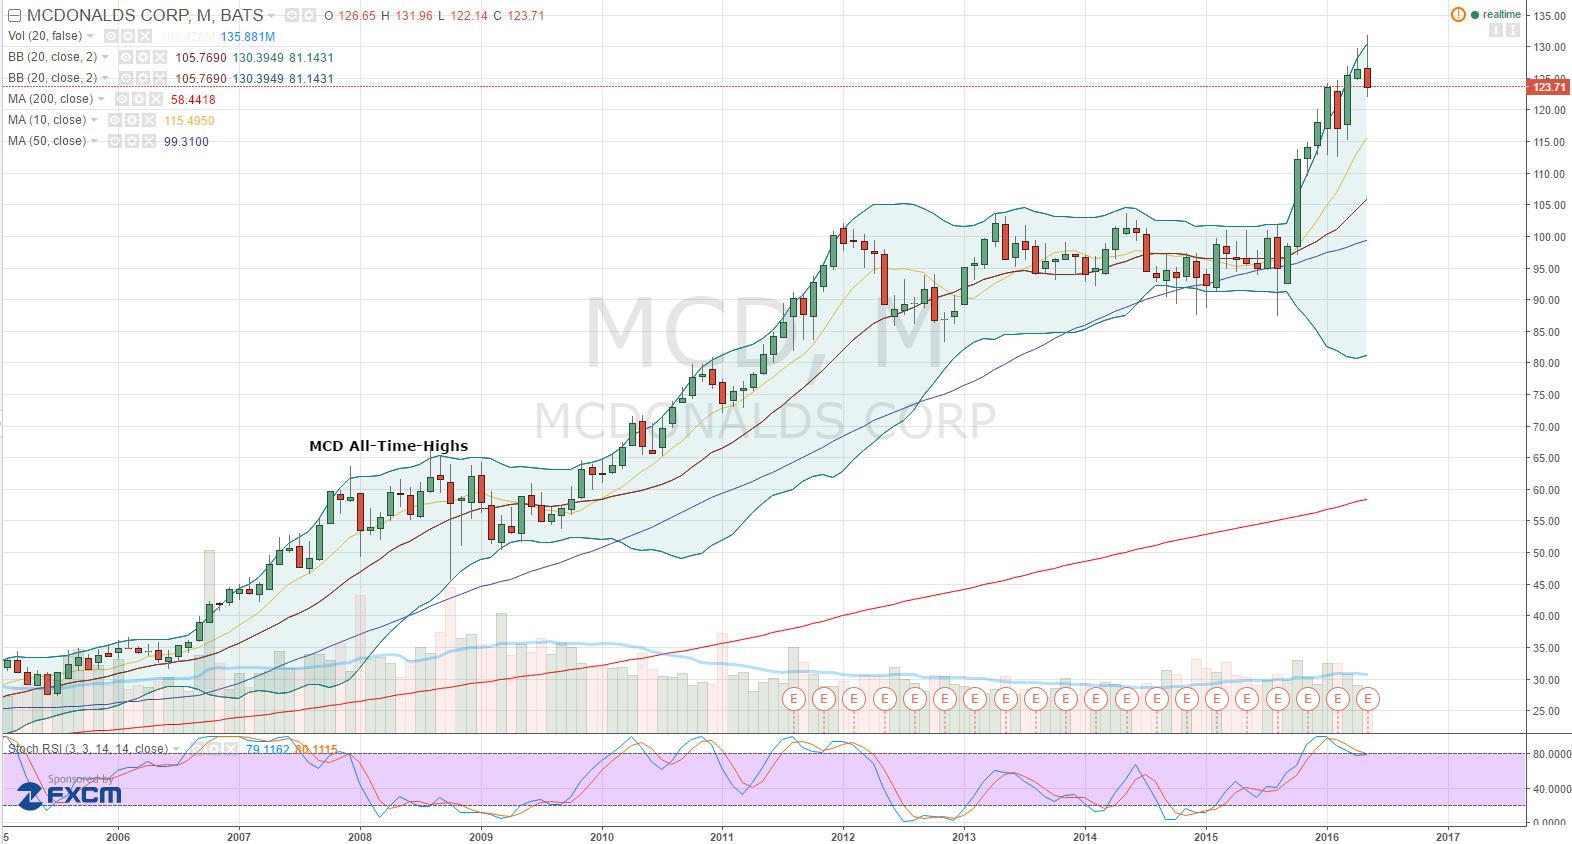 052616-mcd-stock-chart